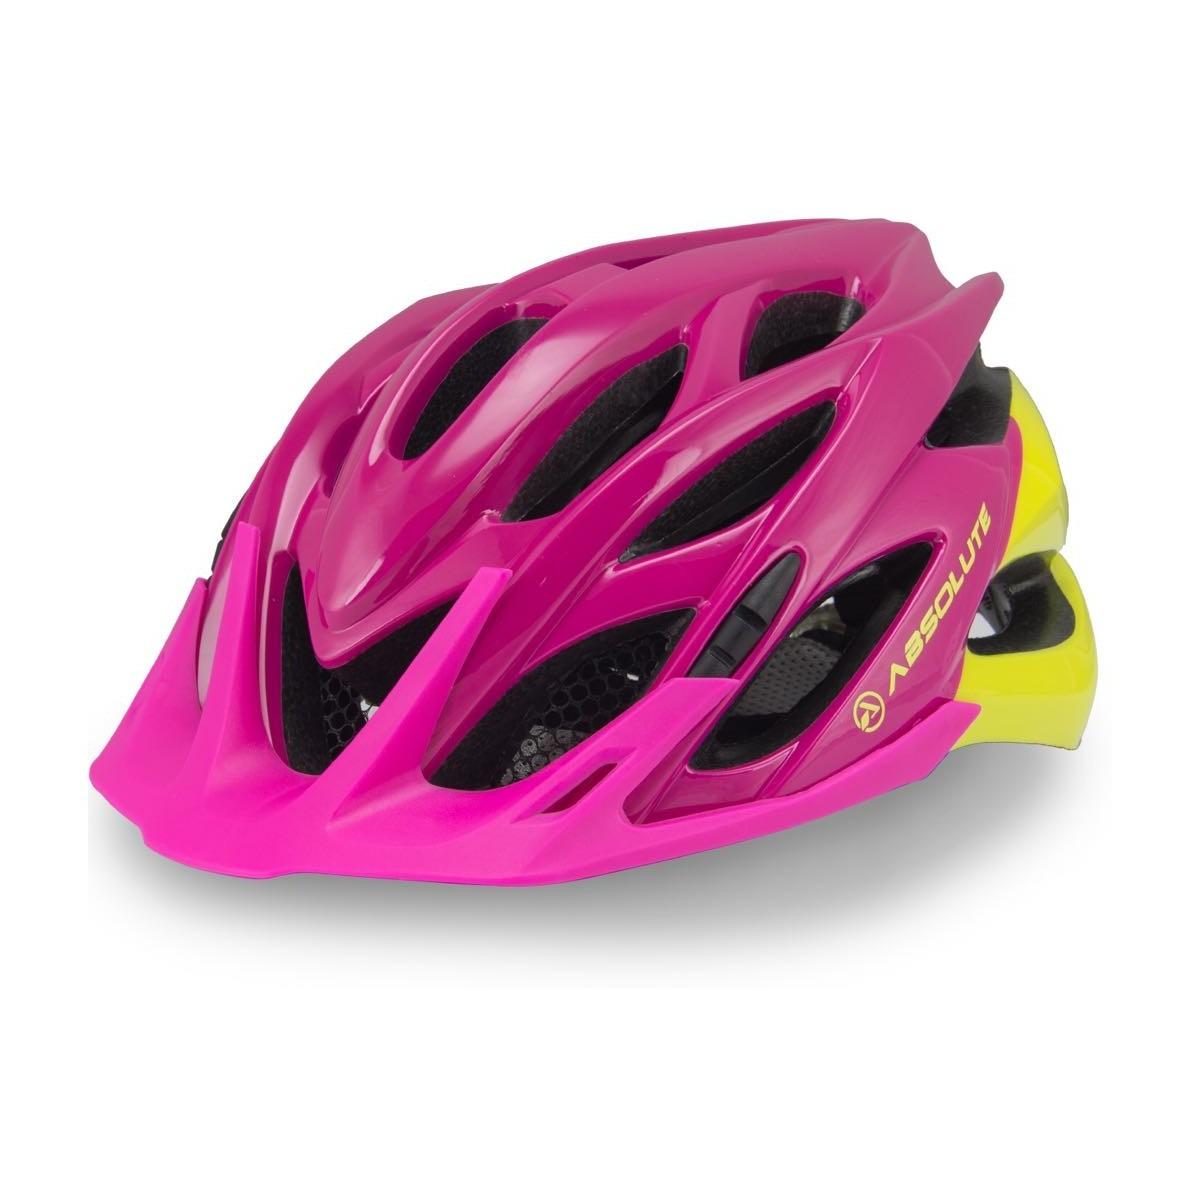 bf3c2ebd0 capacete ciclismo absolute feminino mia c  led mtb speed. Carregando zoom.